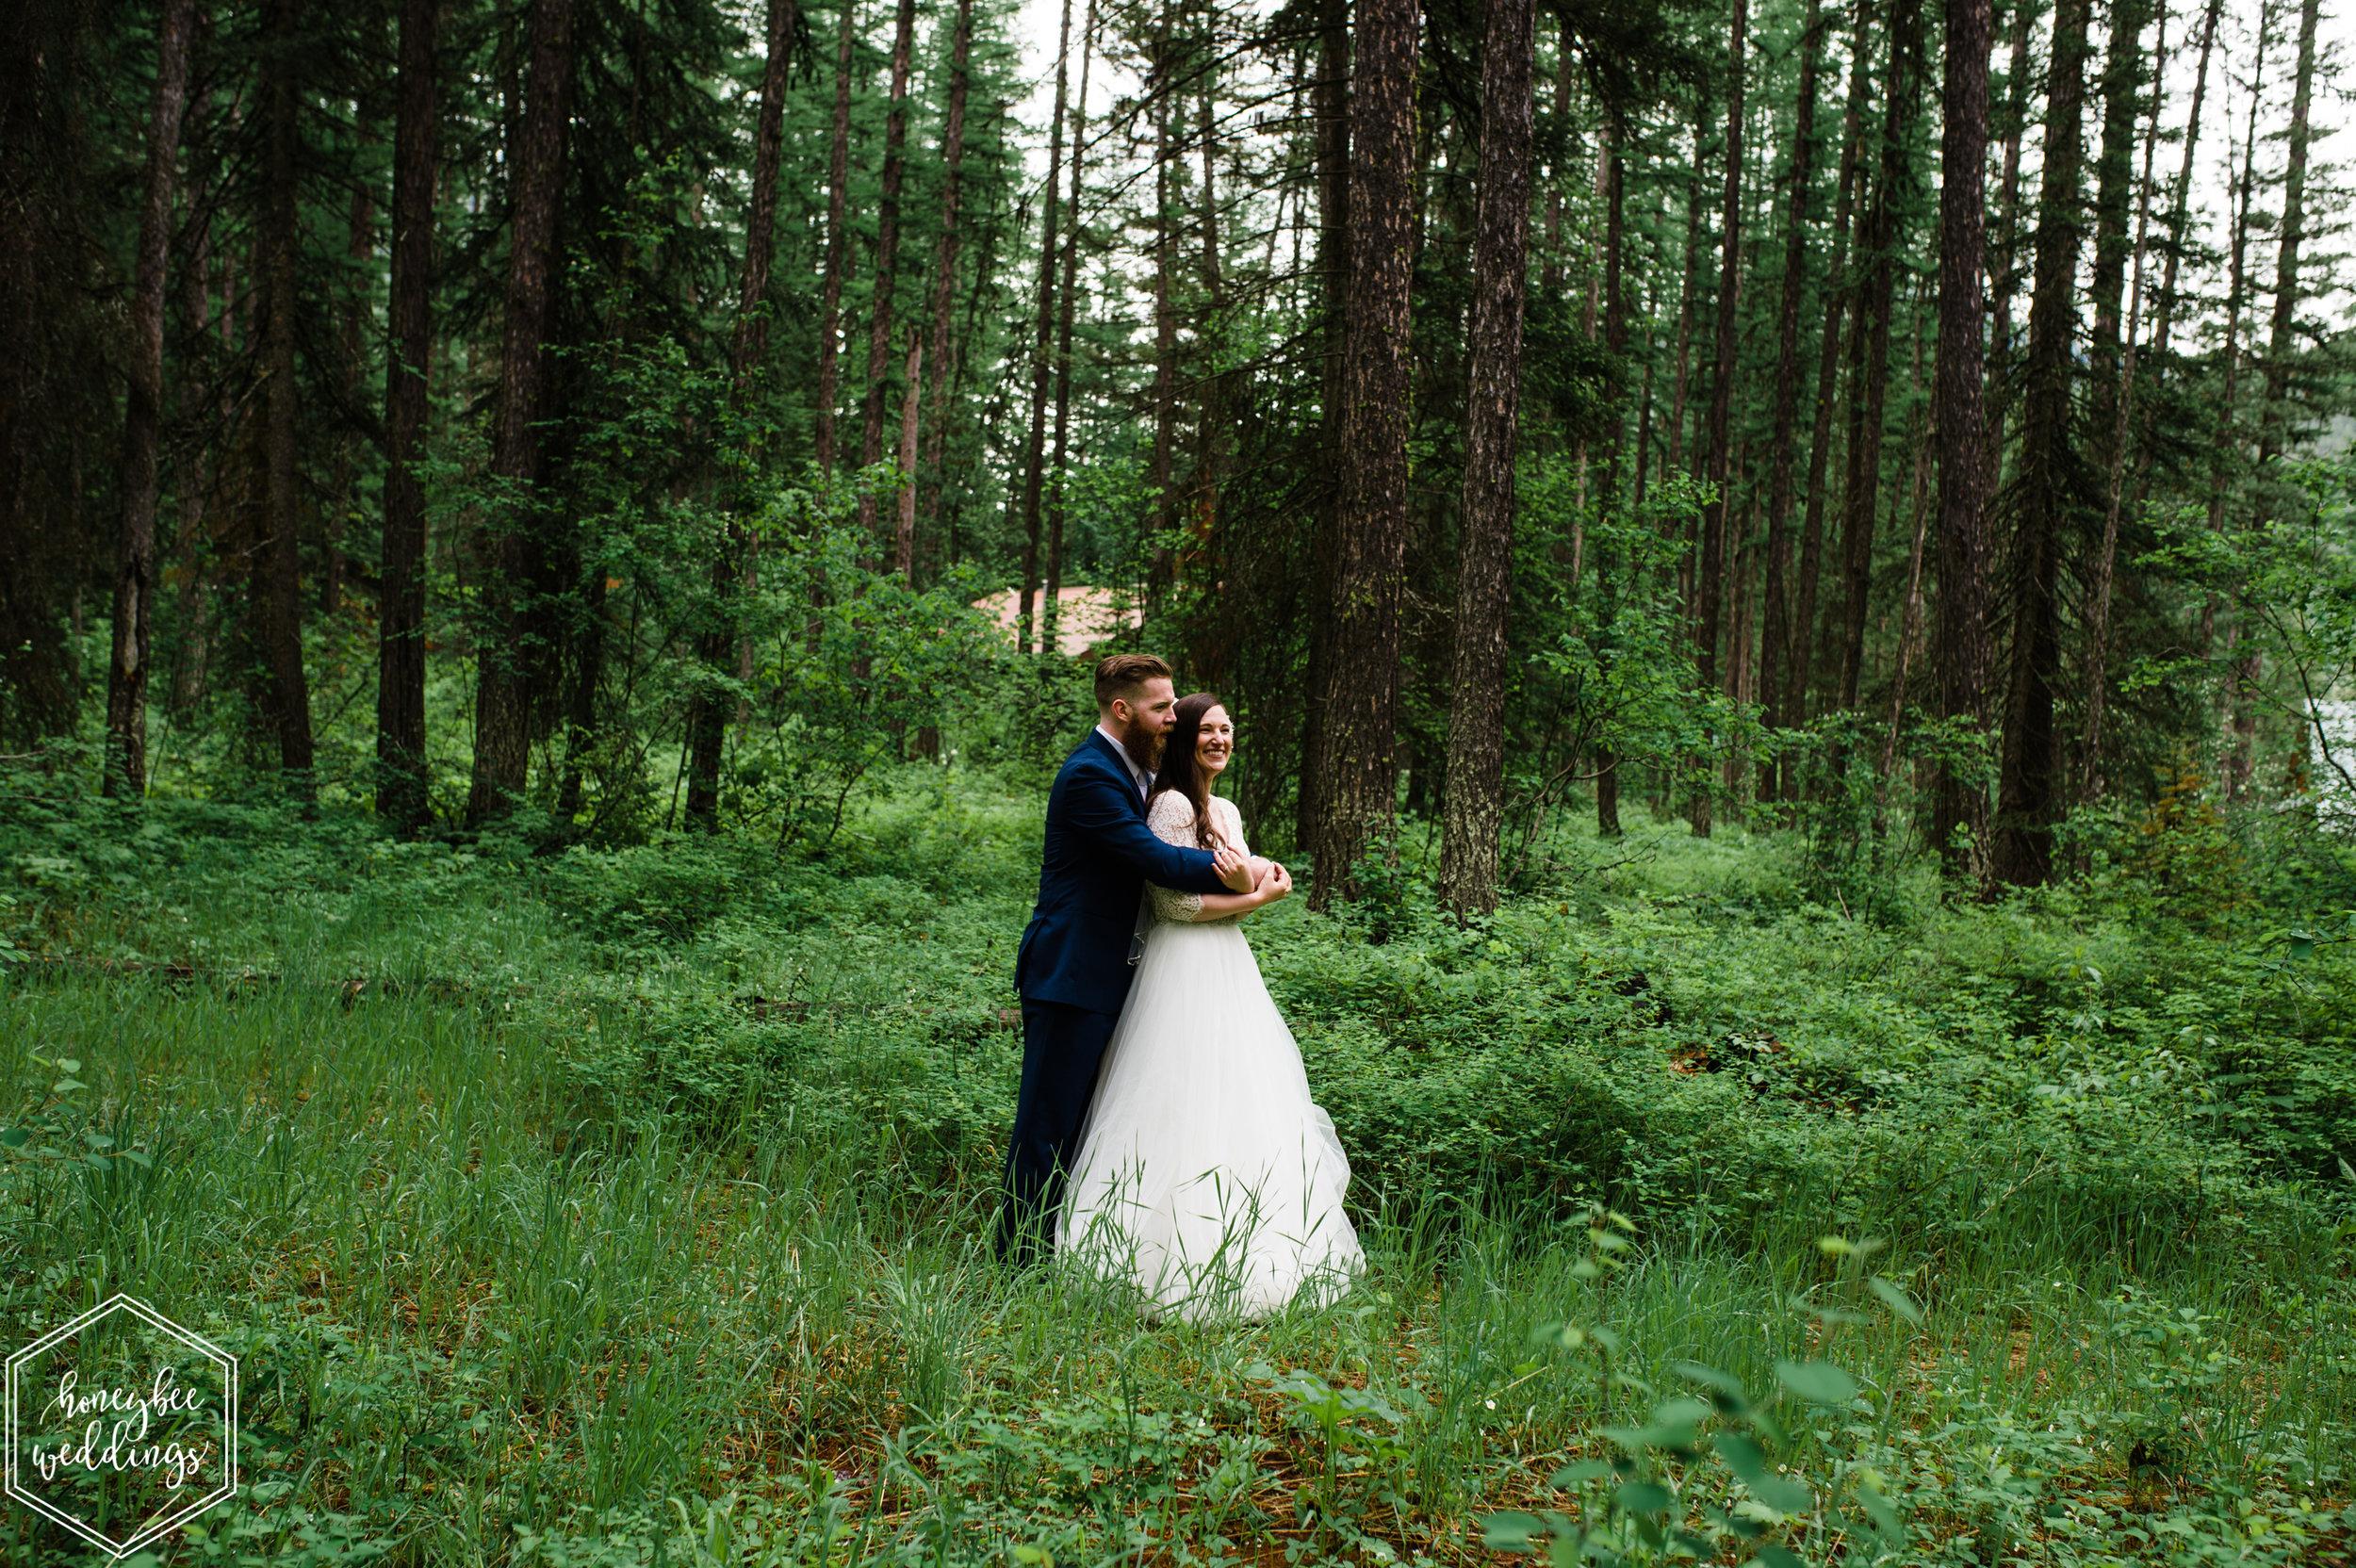 138Glacier National Park Wedding_Izaak Walton Inn Wedding_Honeybee Weddings_Norah & Kyle_June 08, 2019-762.jpg